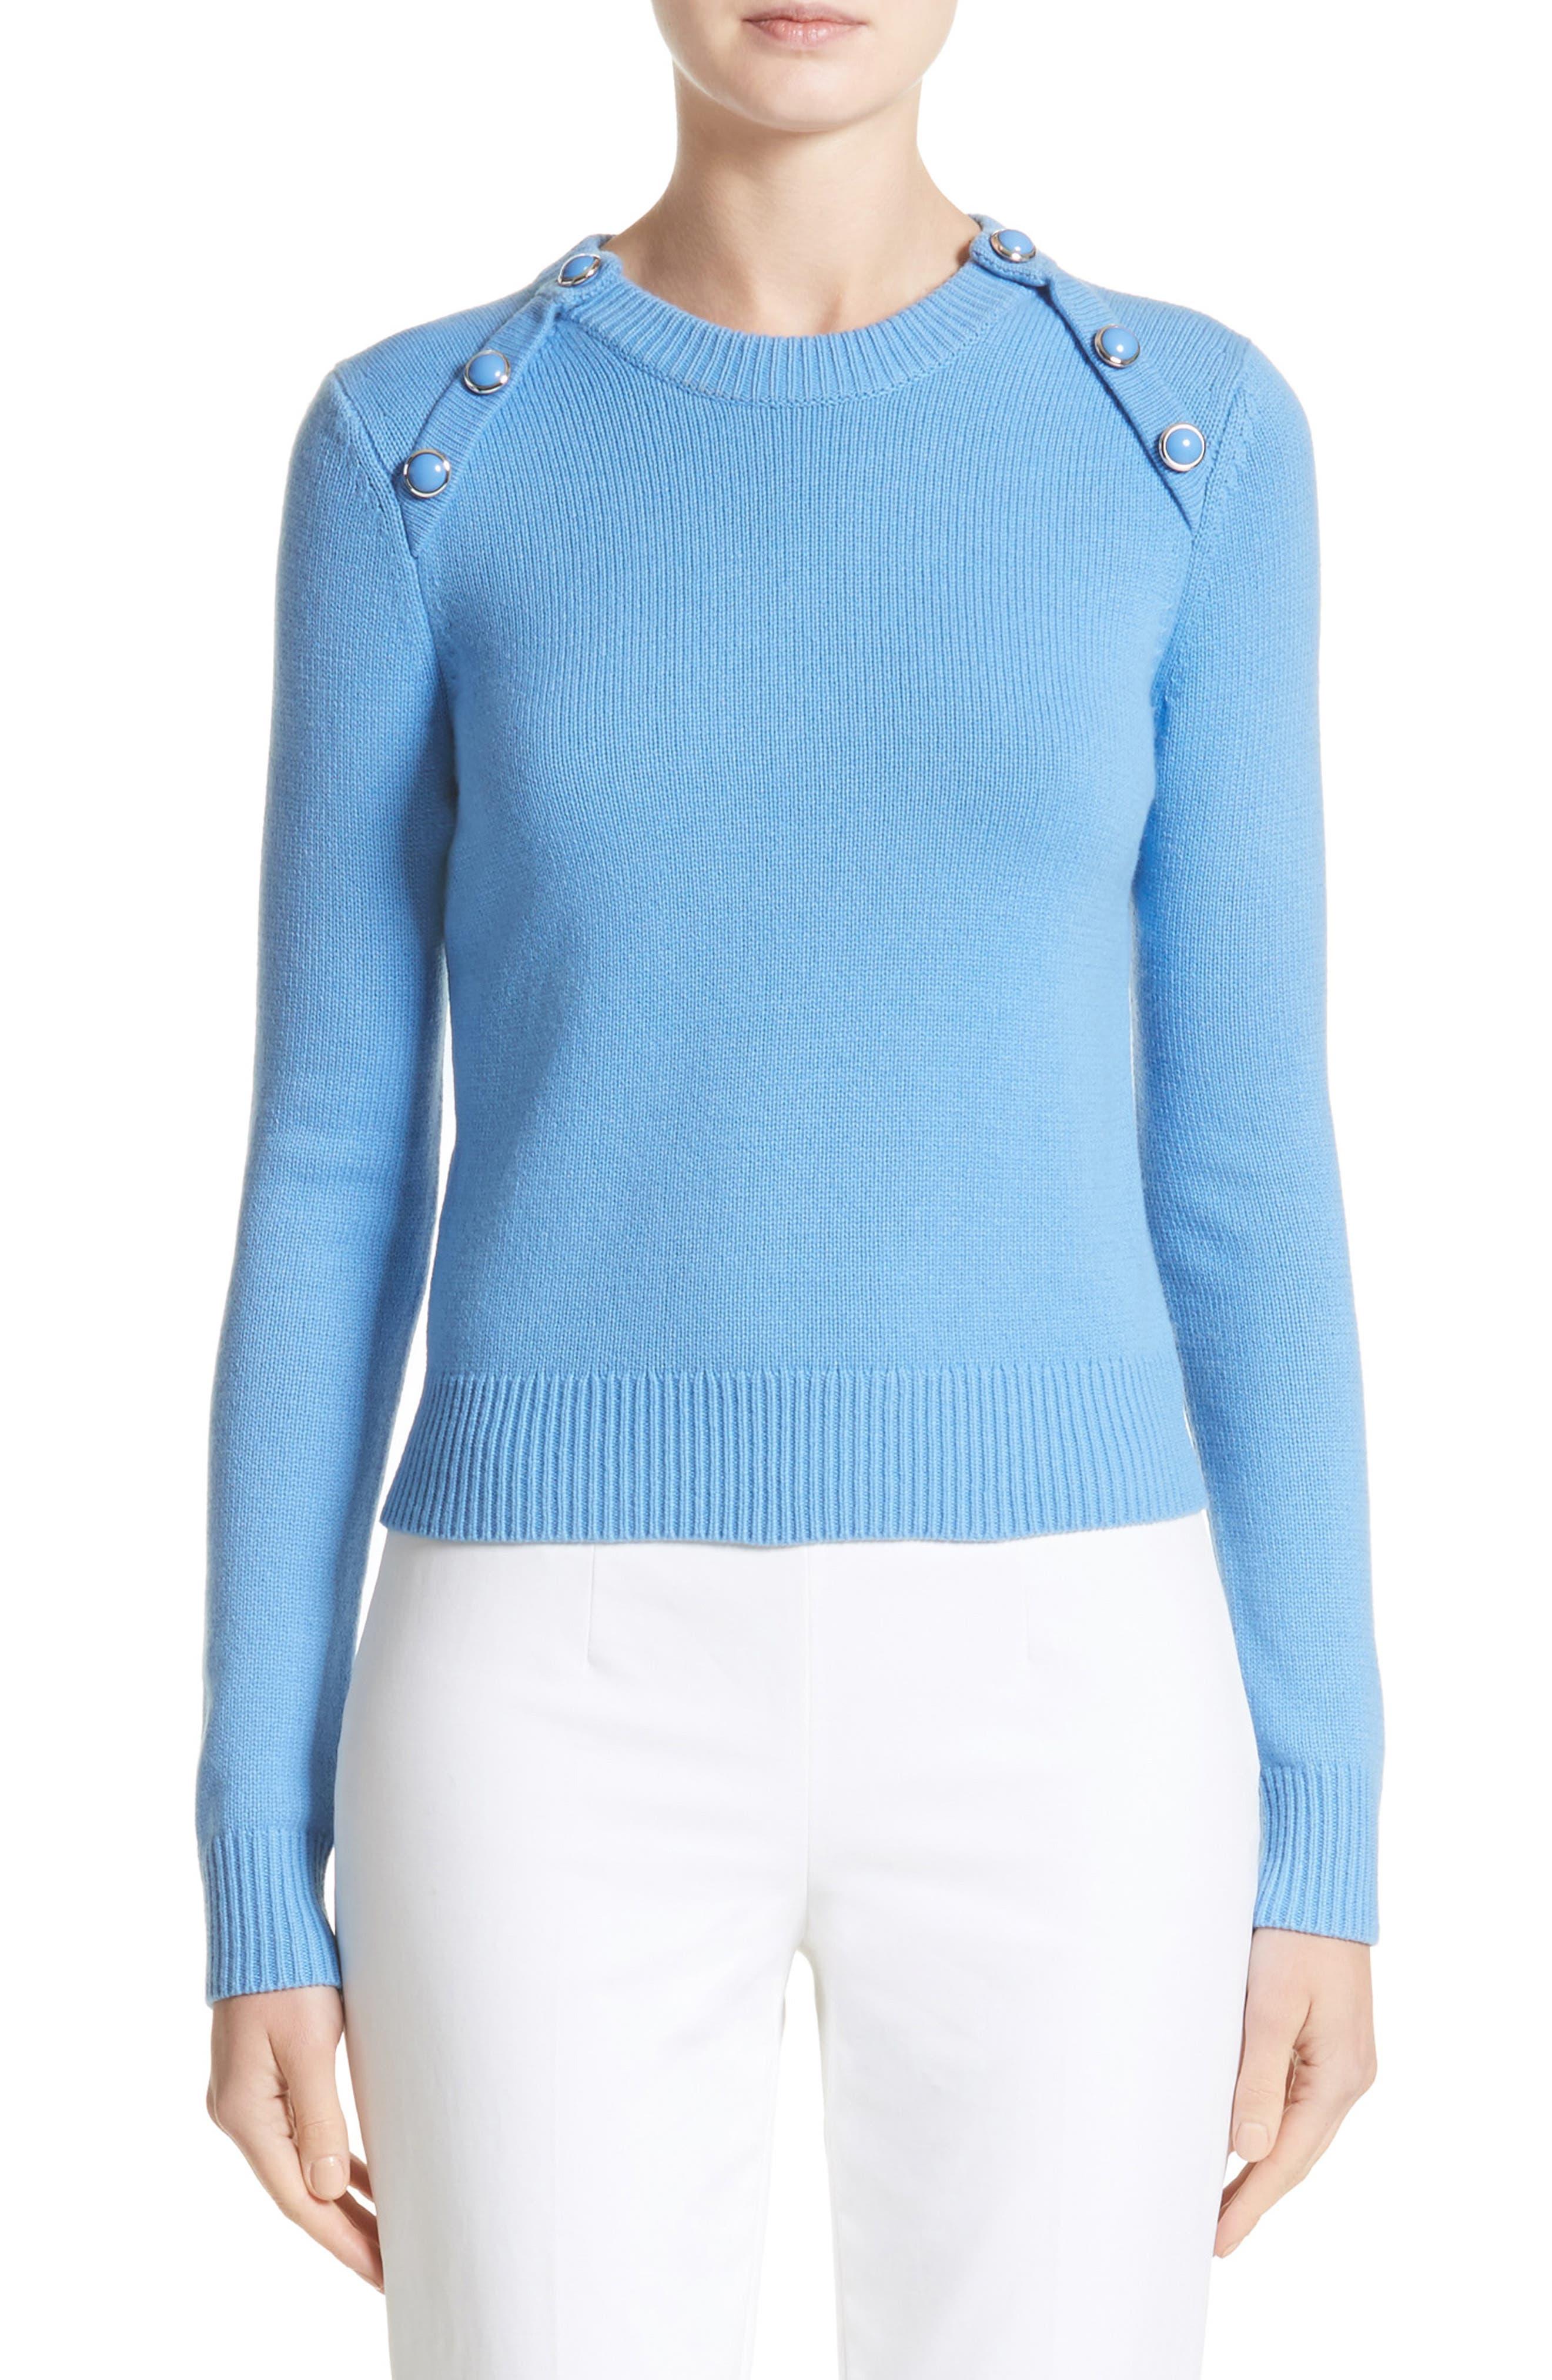 Main Image - Michael Kors Raglan Cashmere Sweater